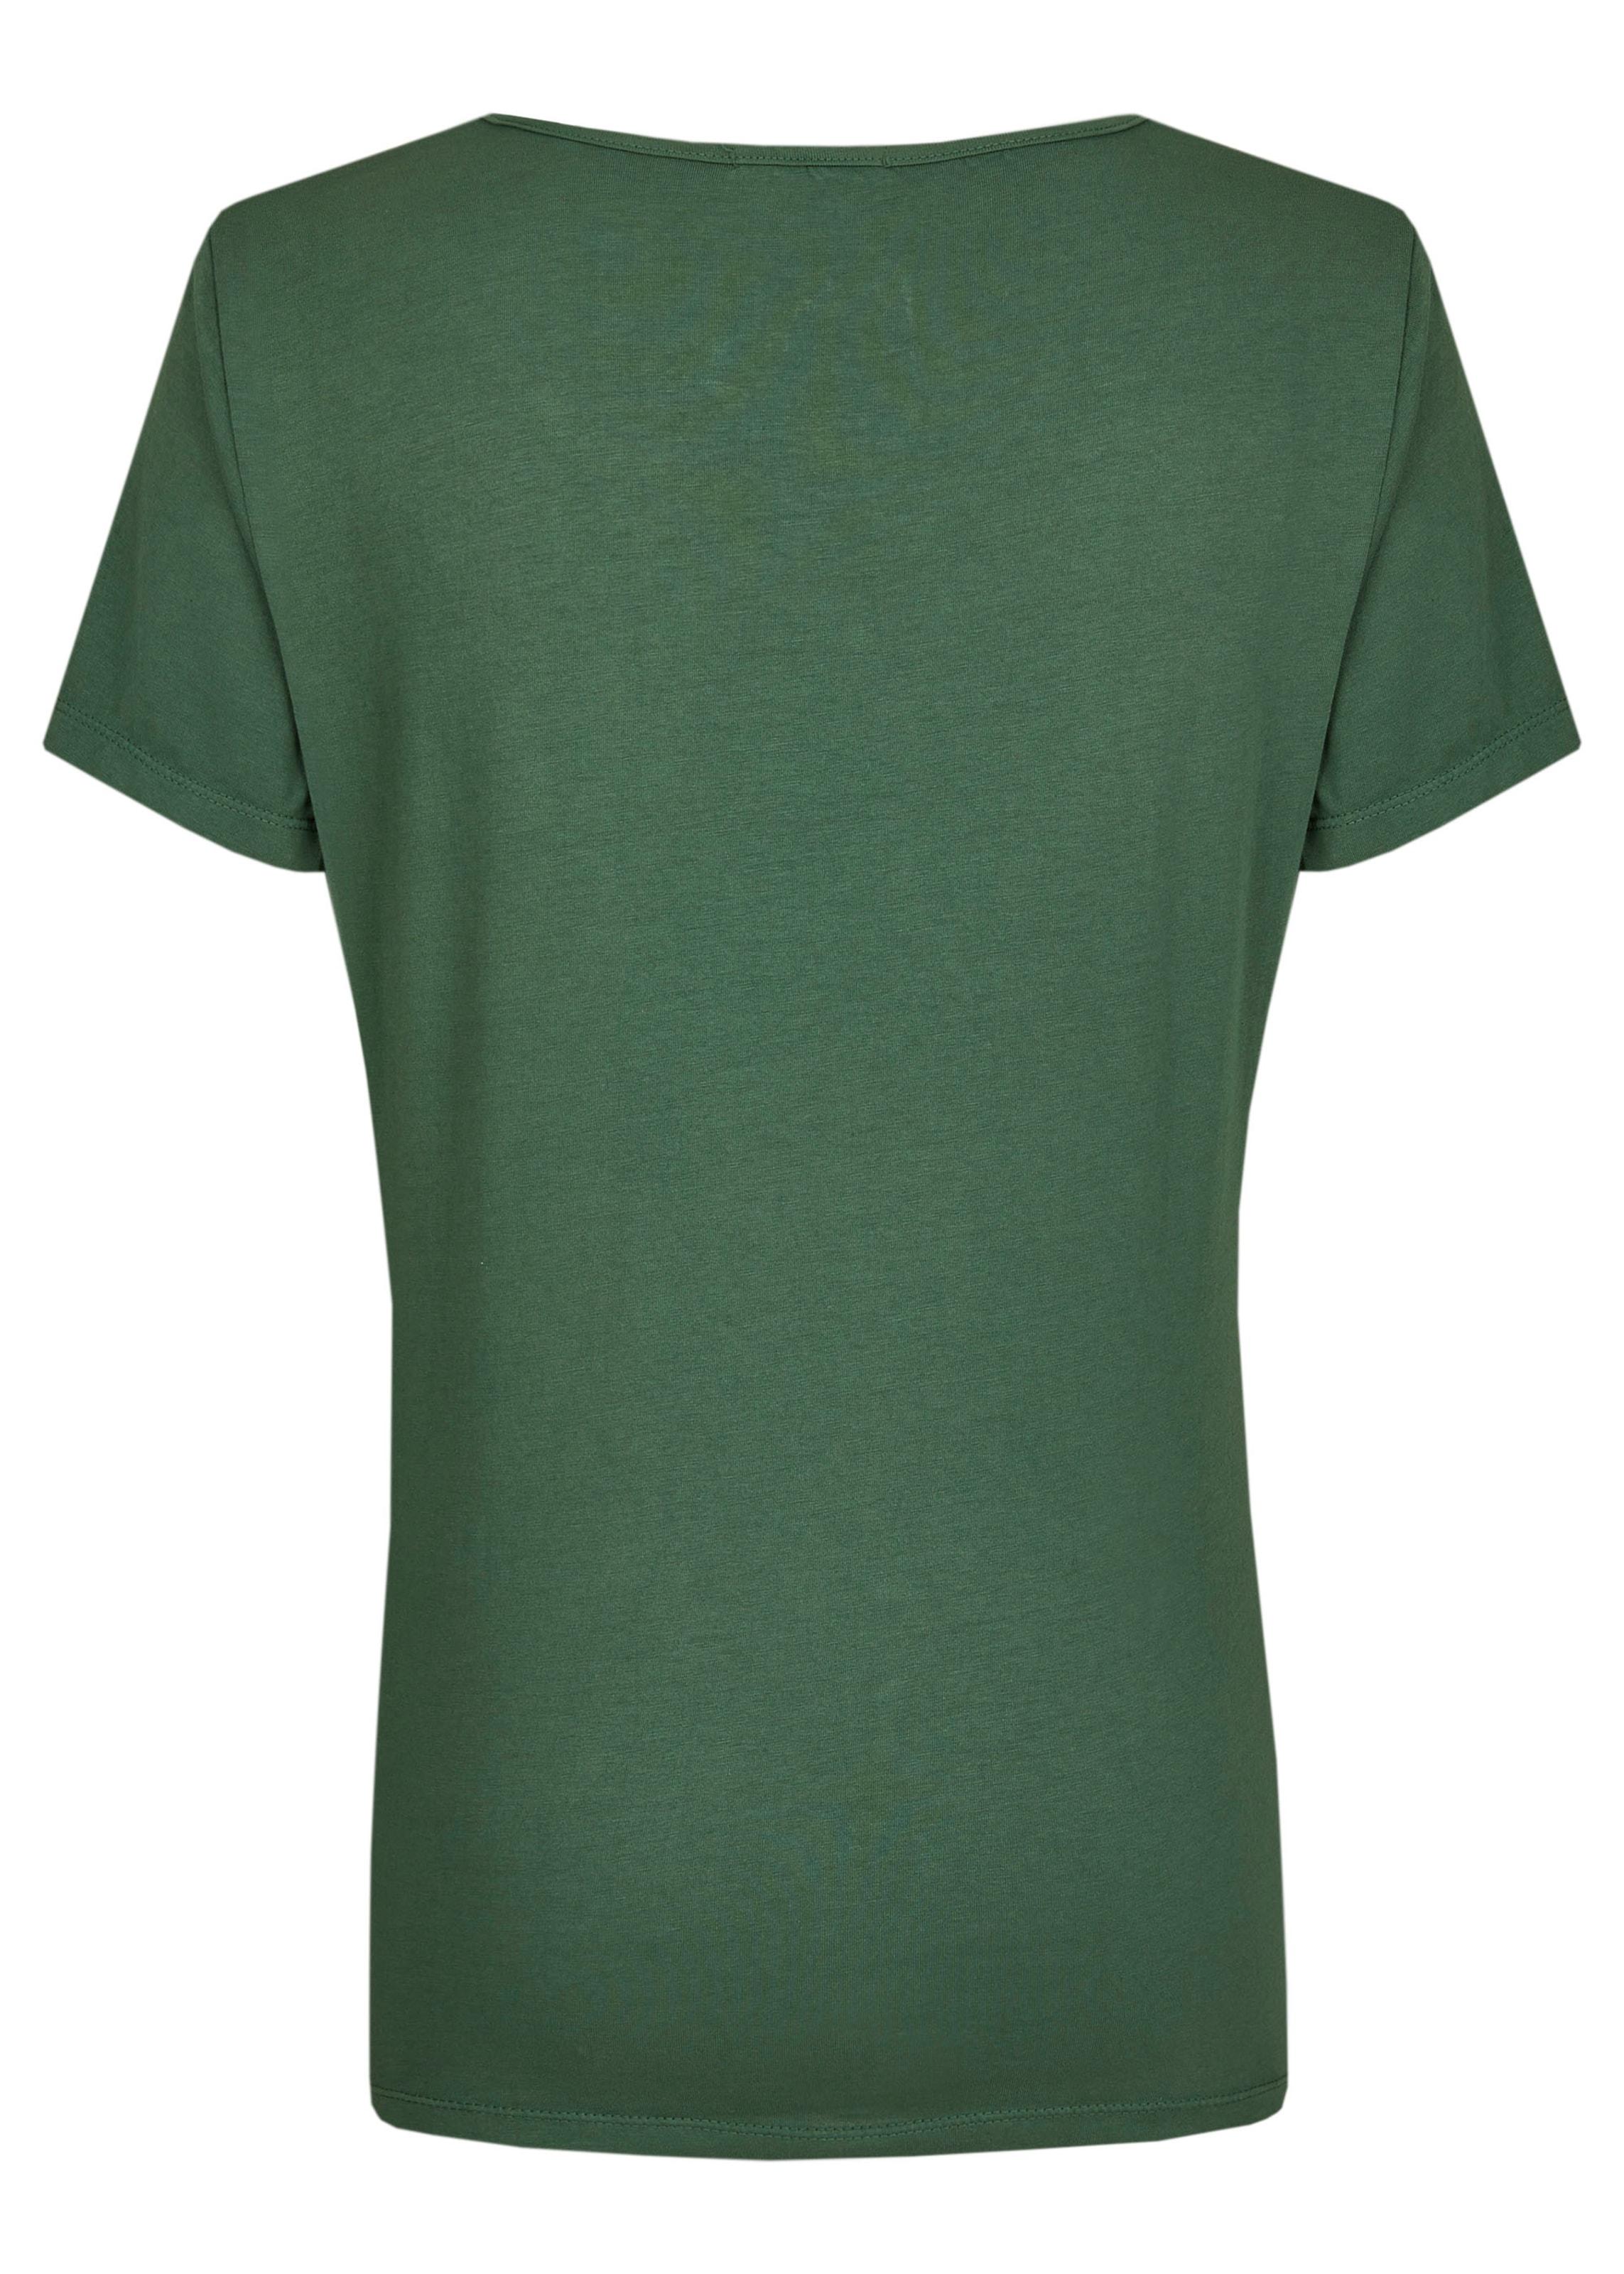 DunkelgrünRosa Shirt In Heimatliebe In Shirt Heimatliebe Ibgf7y6vY